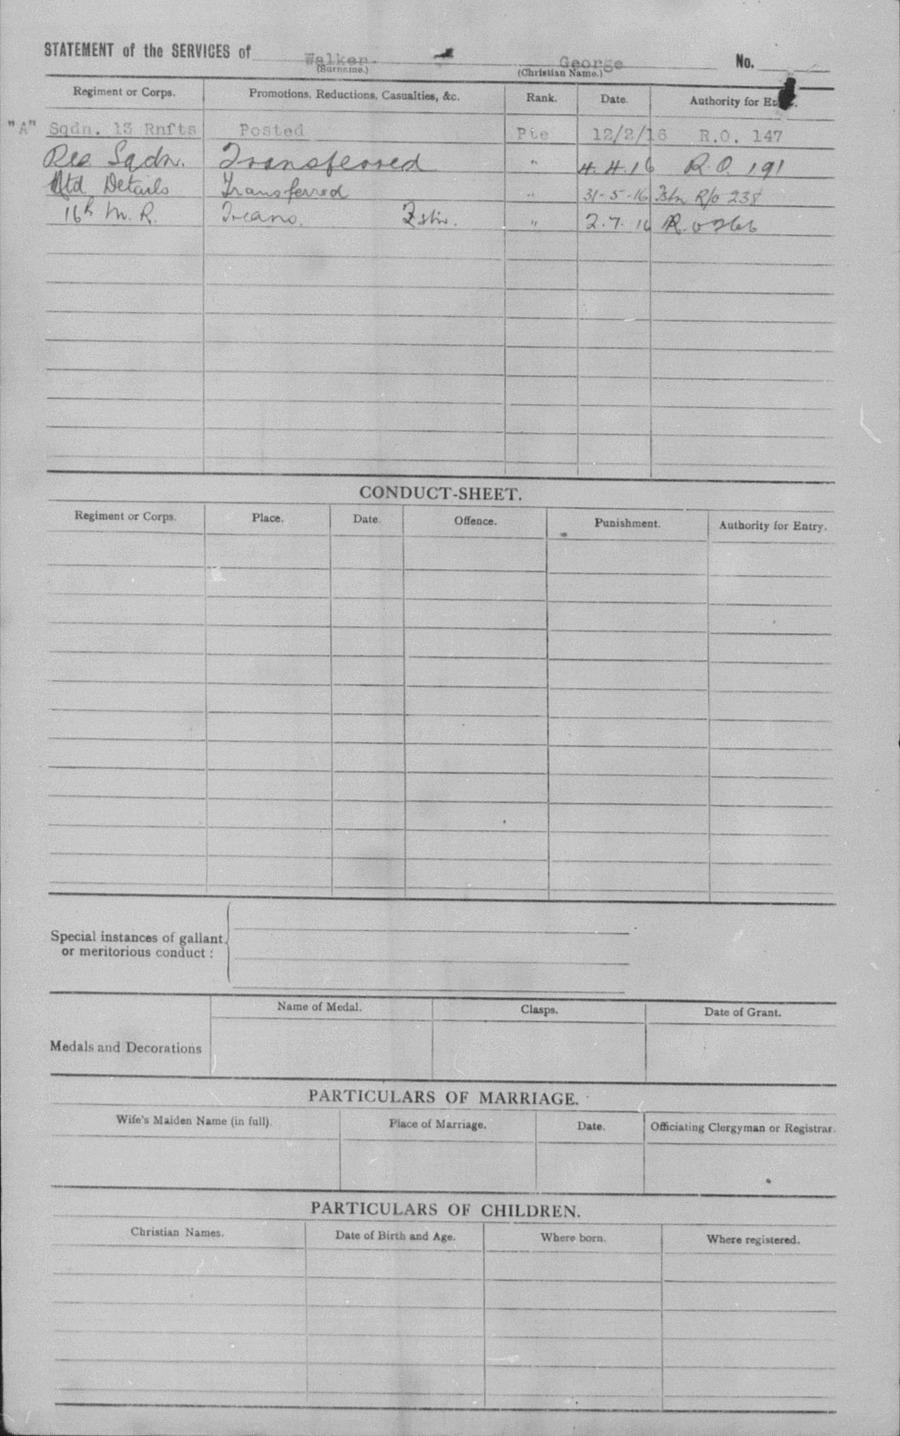 WALKER, George - WW1 35866 - Army